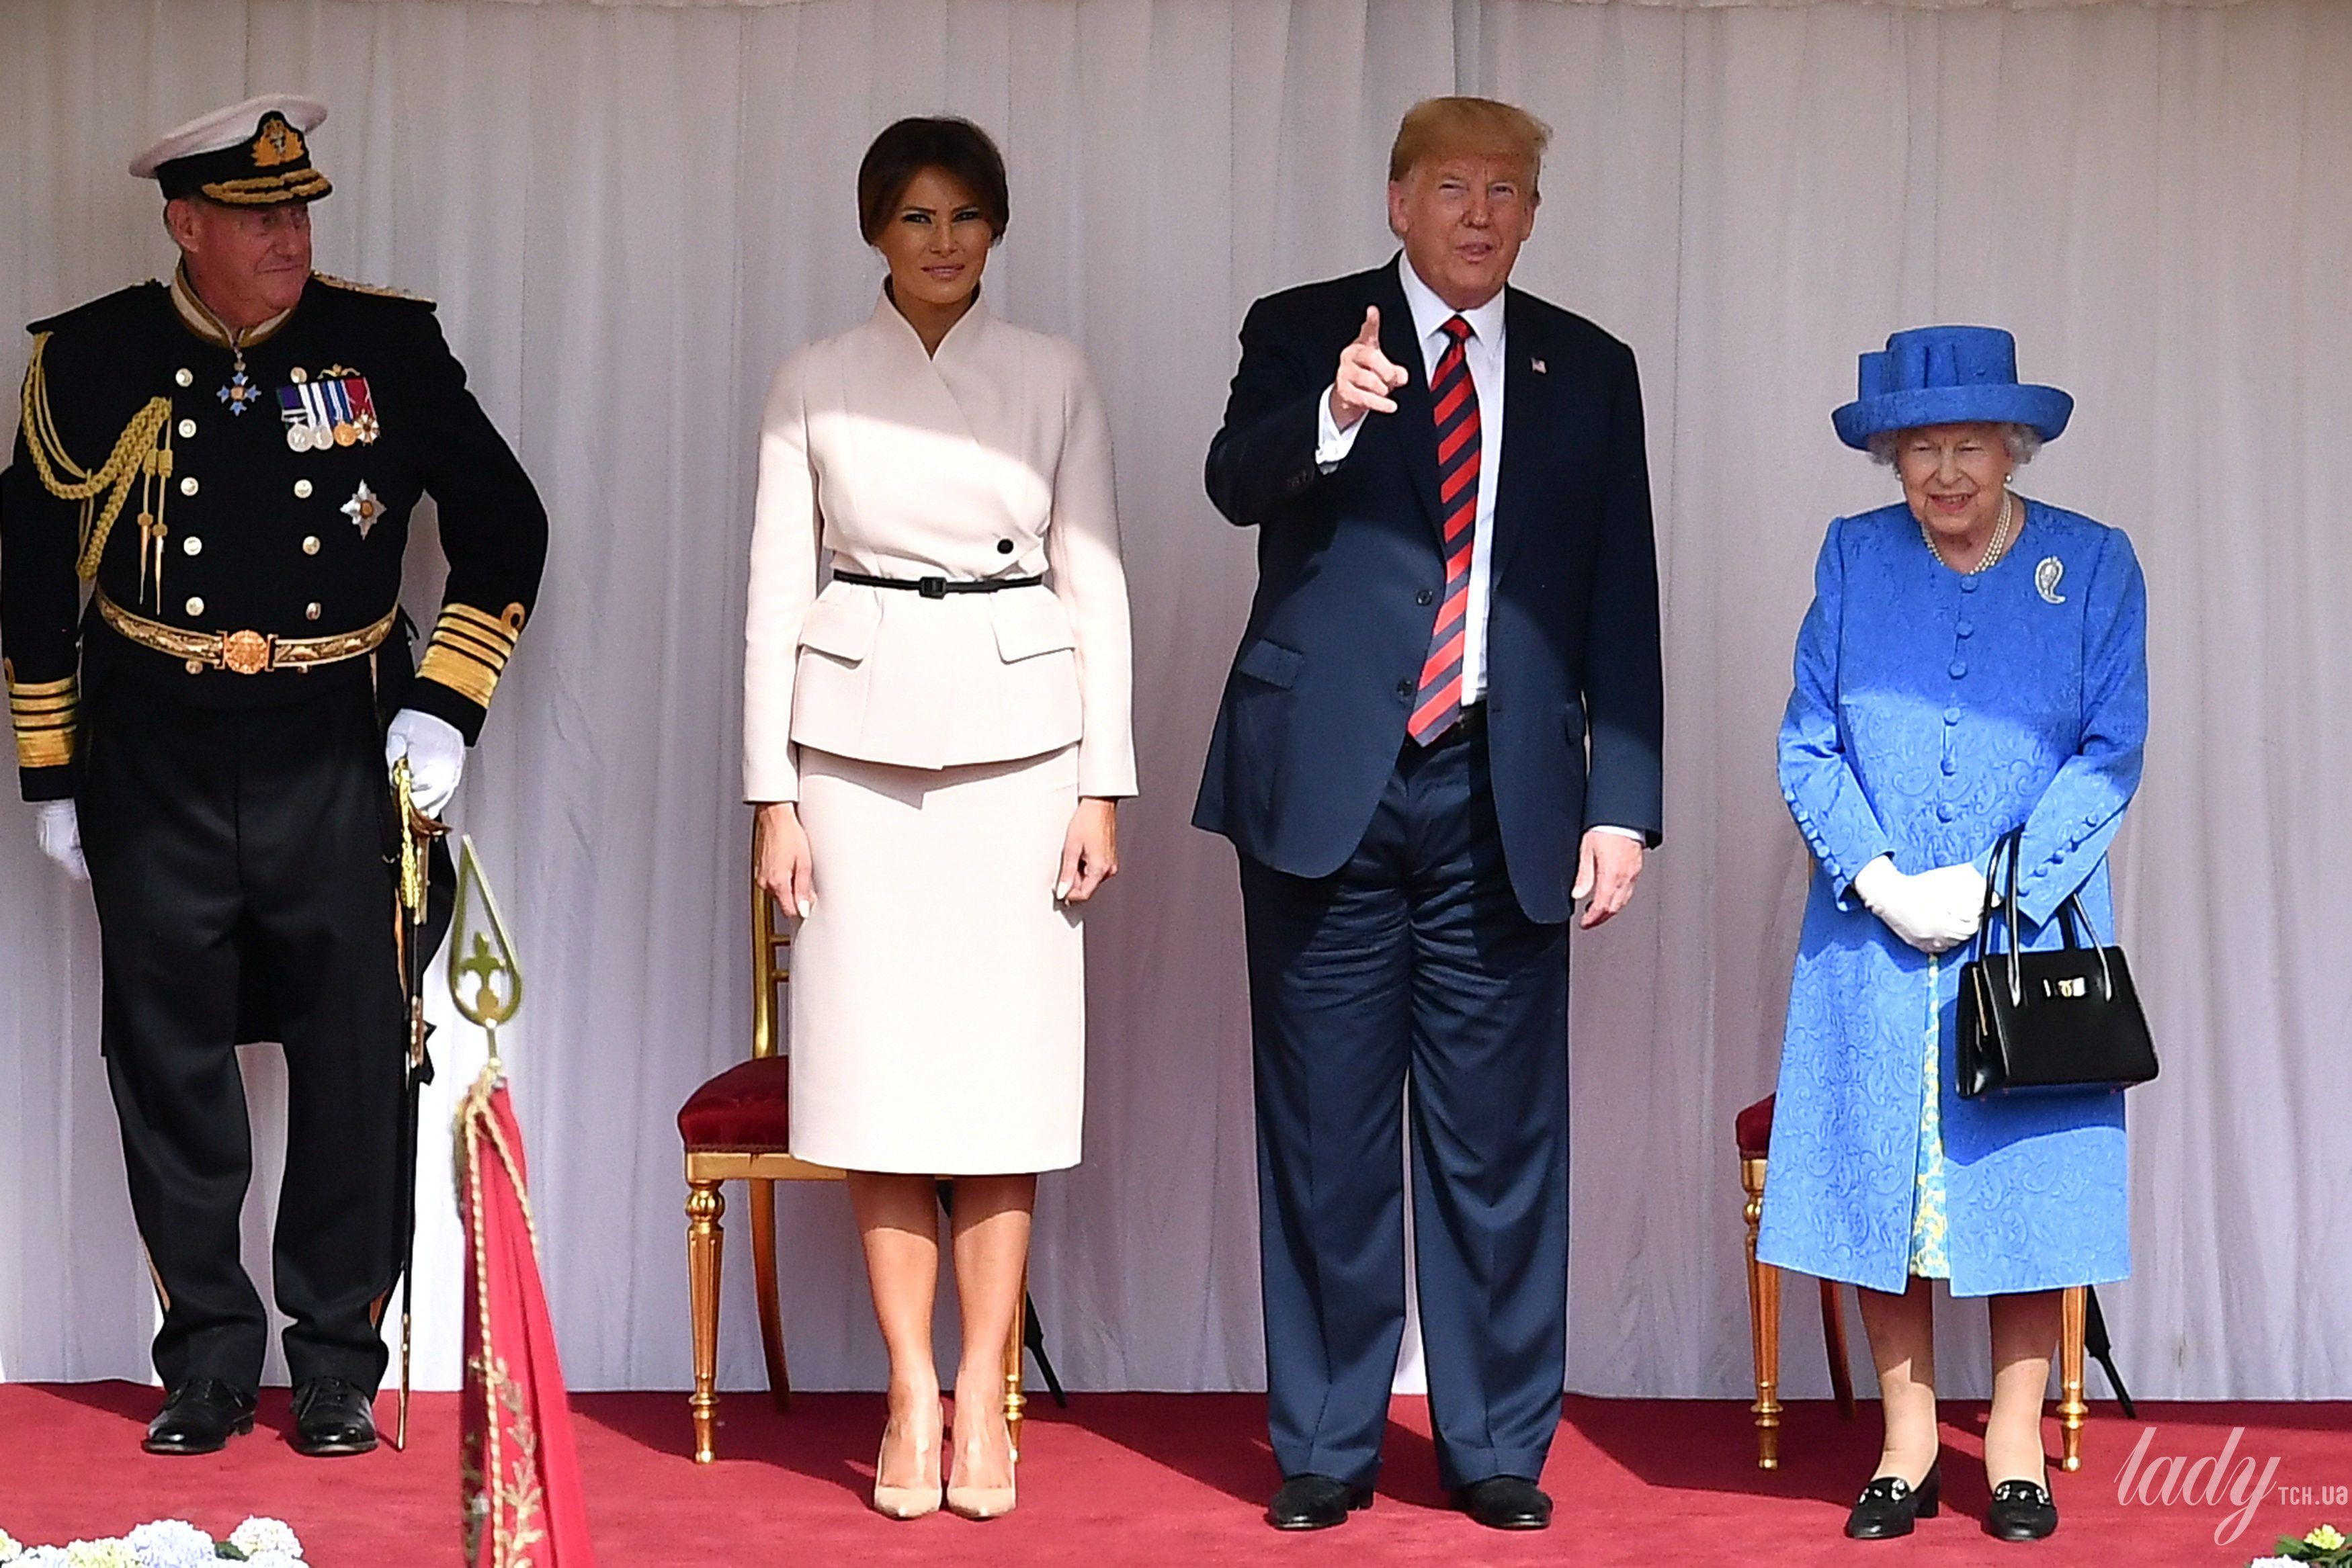 Королева Елизавета II, Мелания Трамп и Дональд Трамп_17